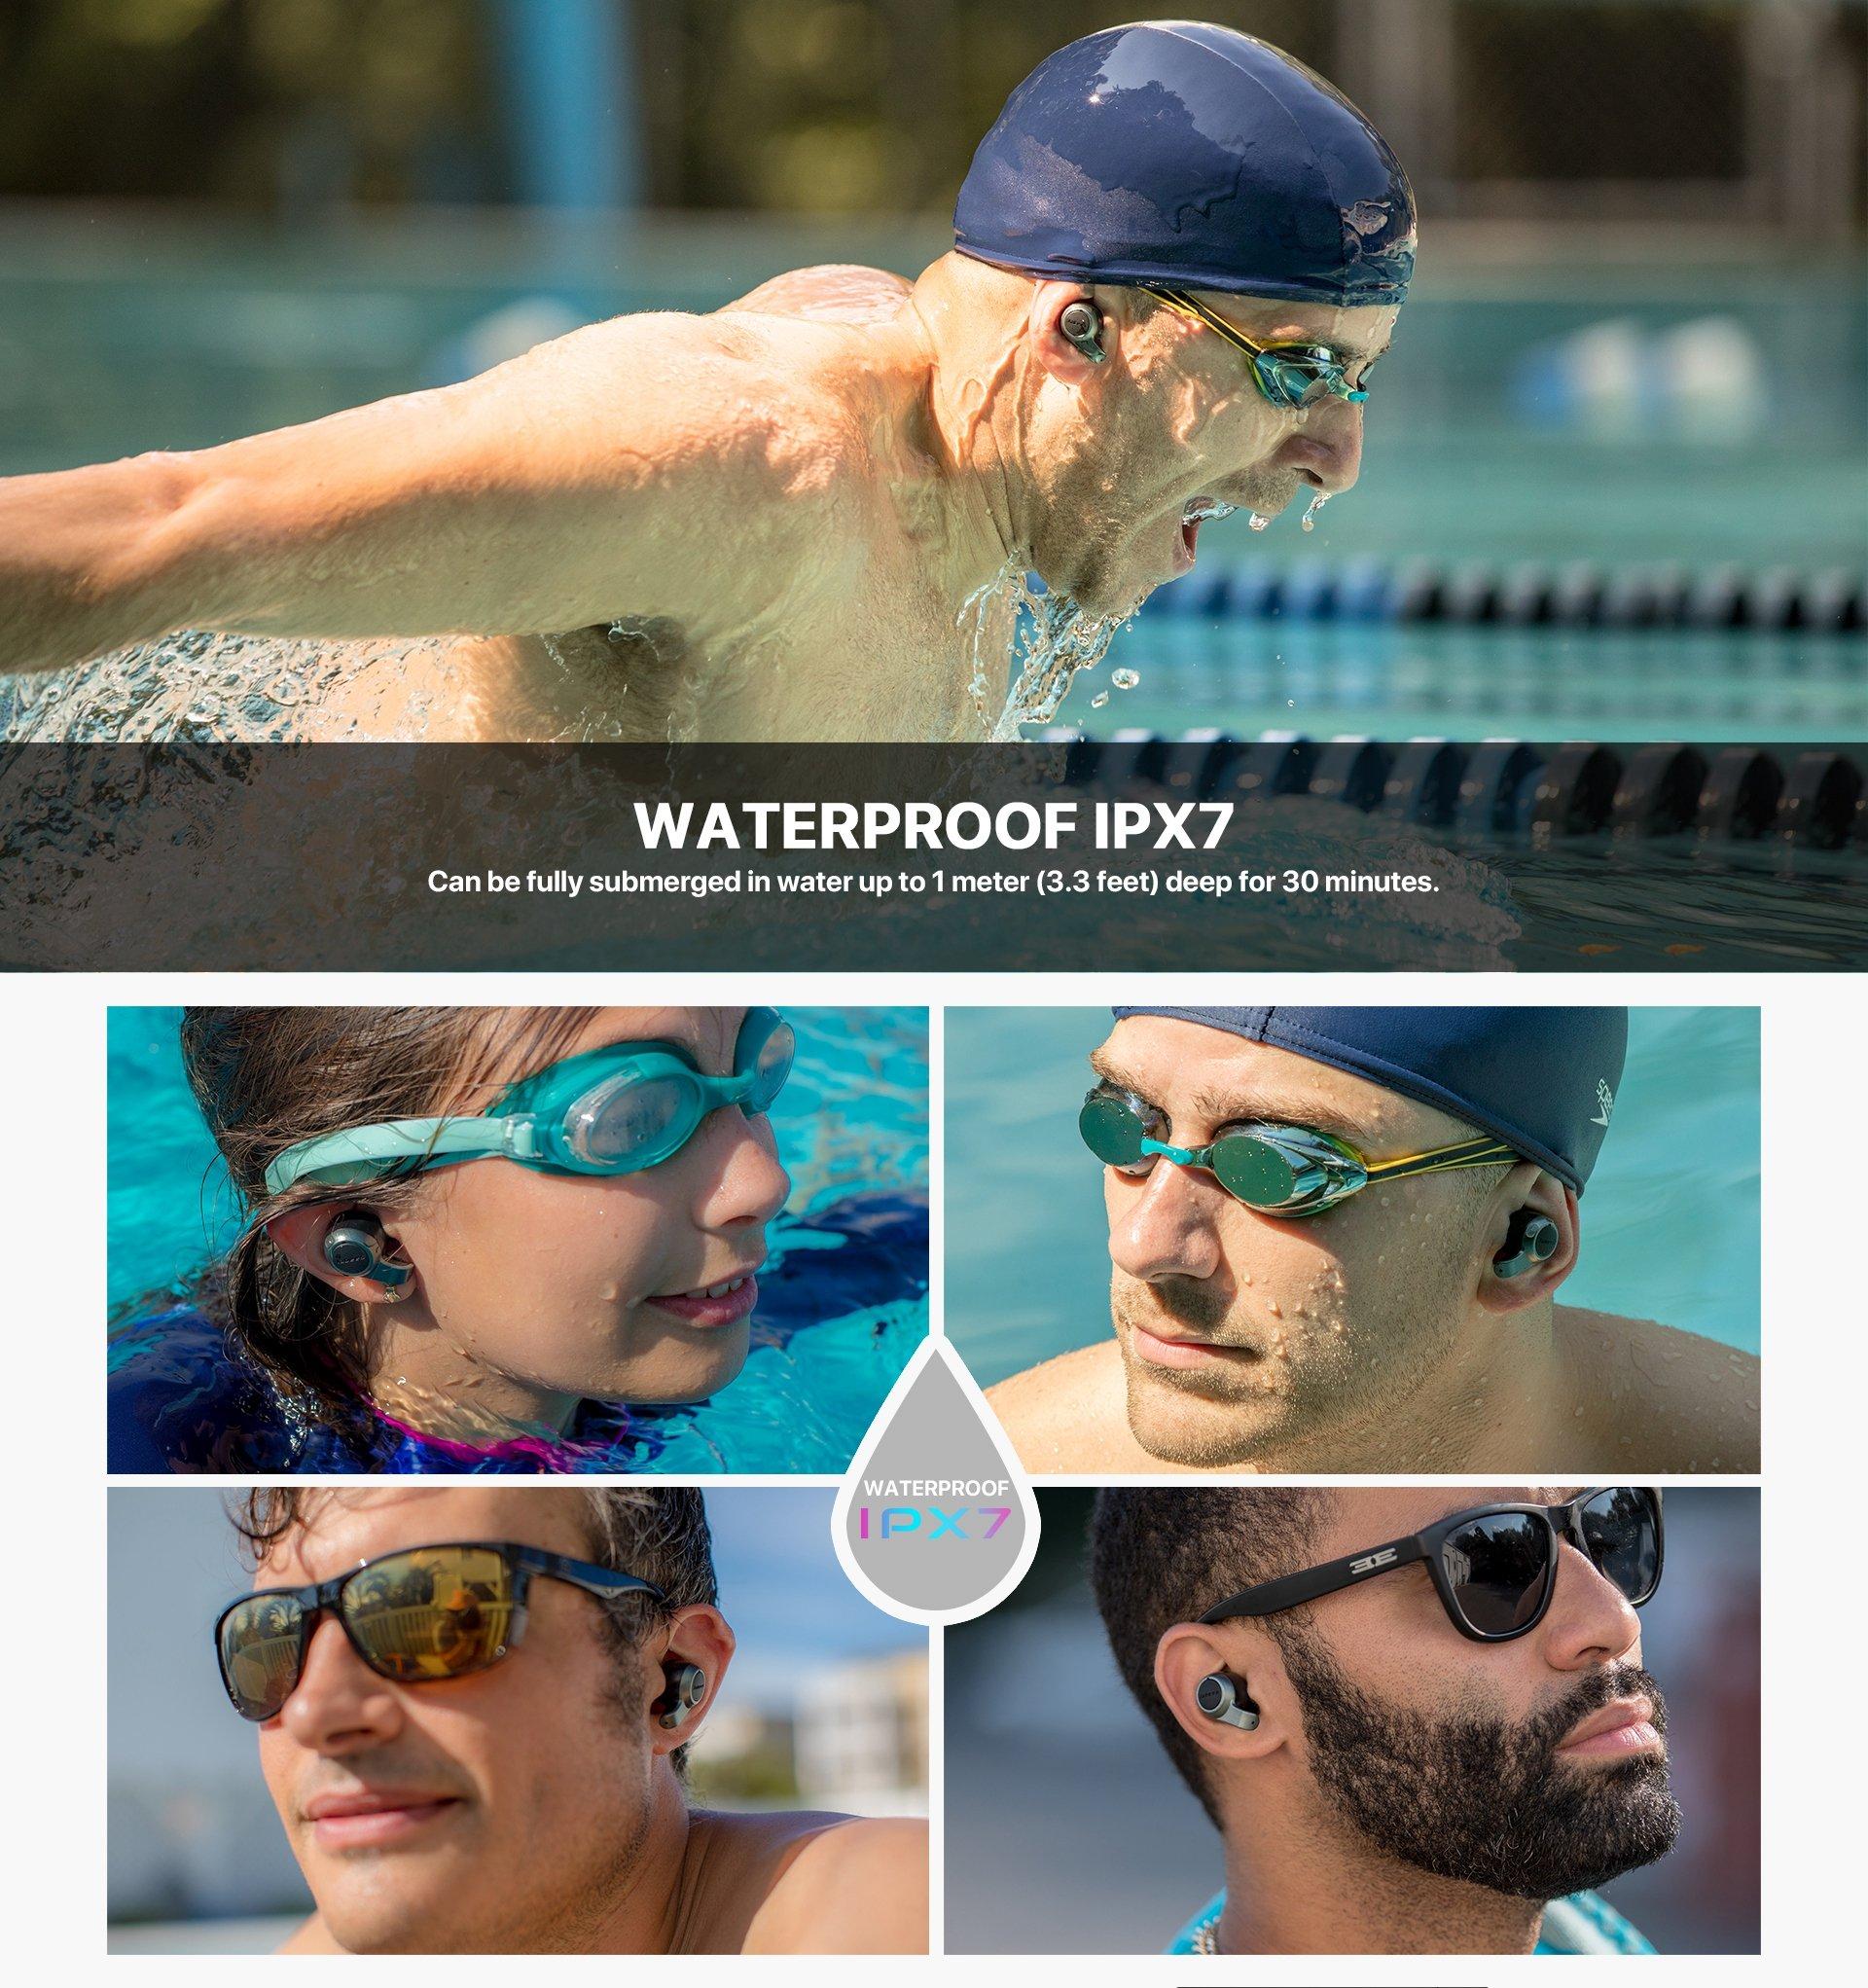 Jabees Firefly 2 Black Touch TWS Earbuds Waterproof & Dustproof IPX7 3